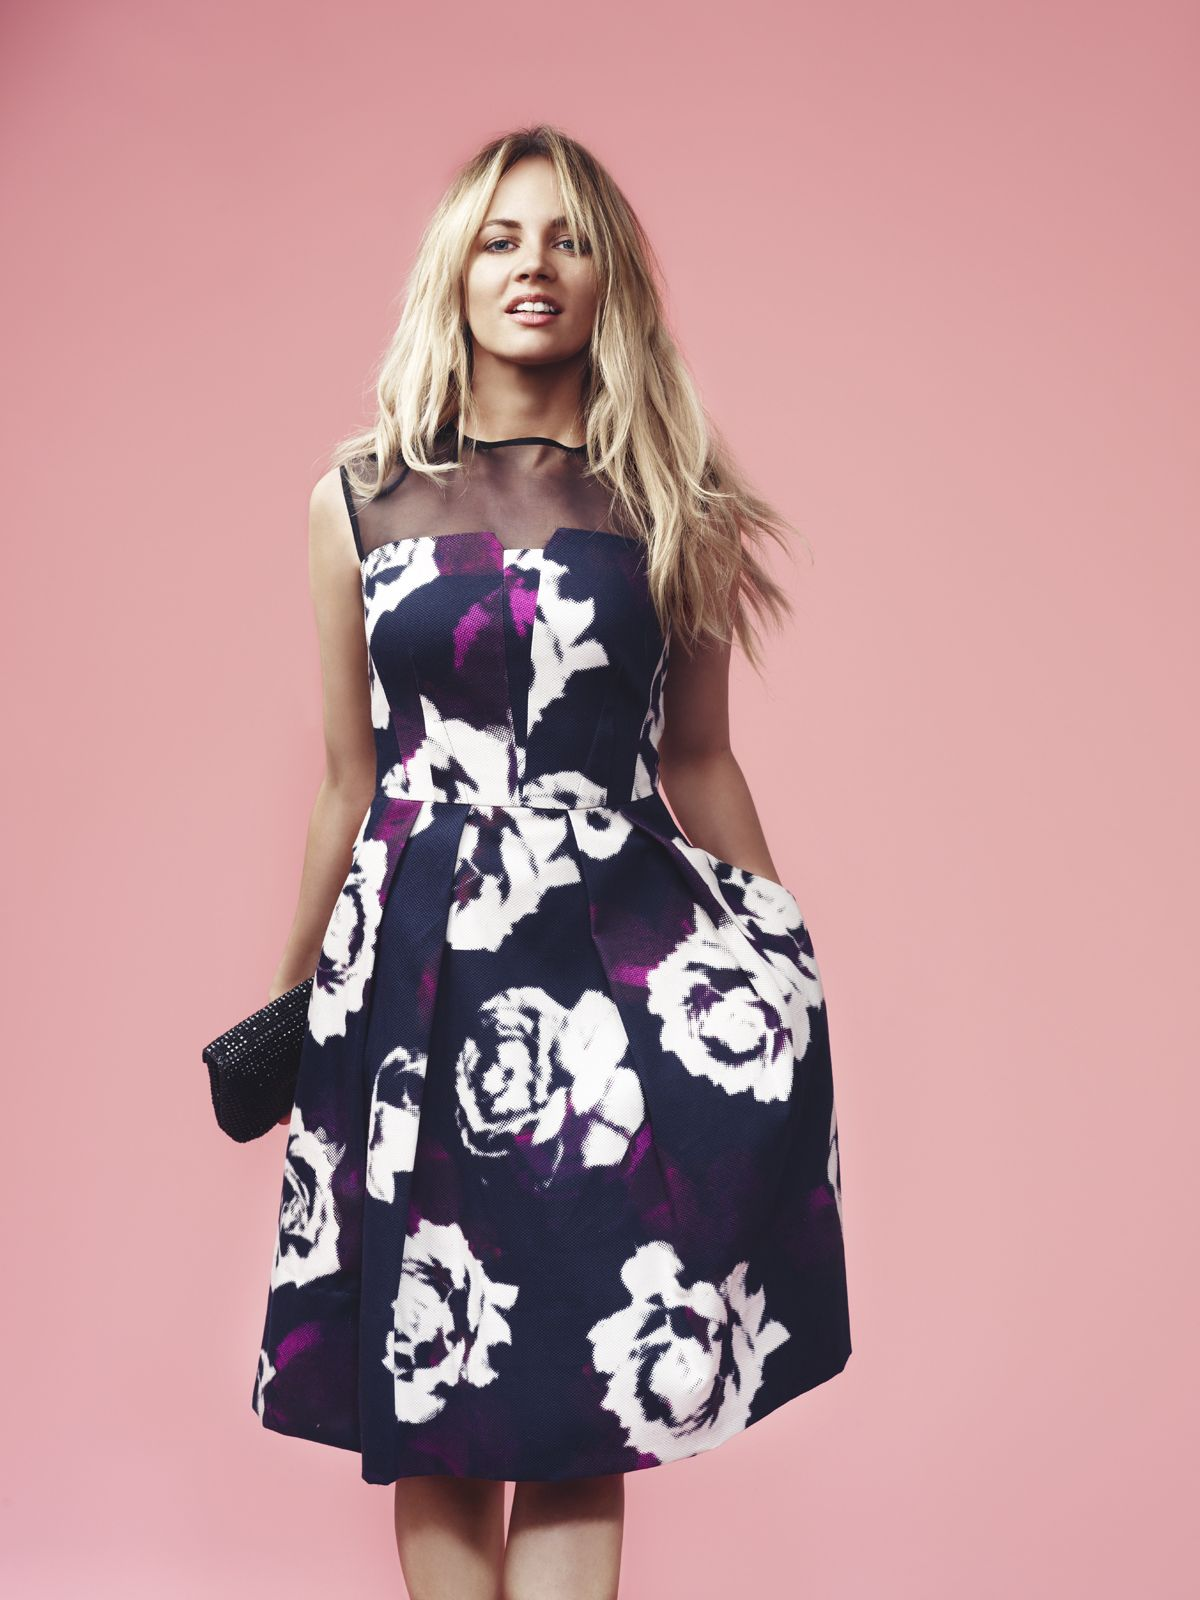 Samantha Jade wears the Veronika Maine Large Floral Print Dress $299 ...